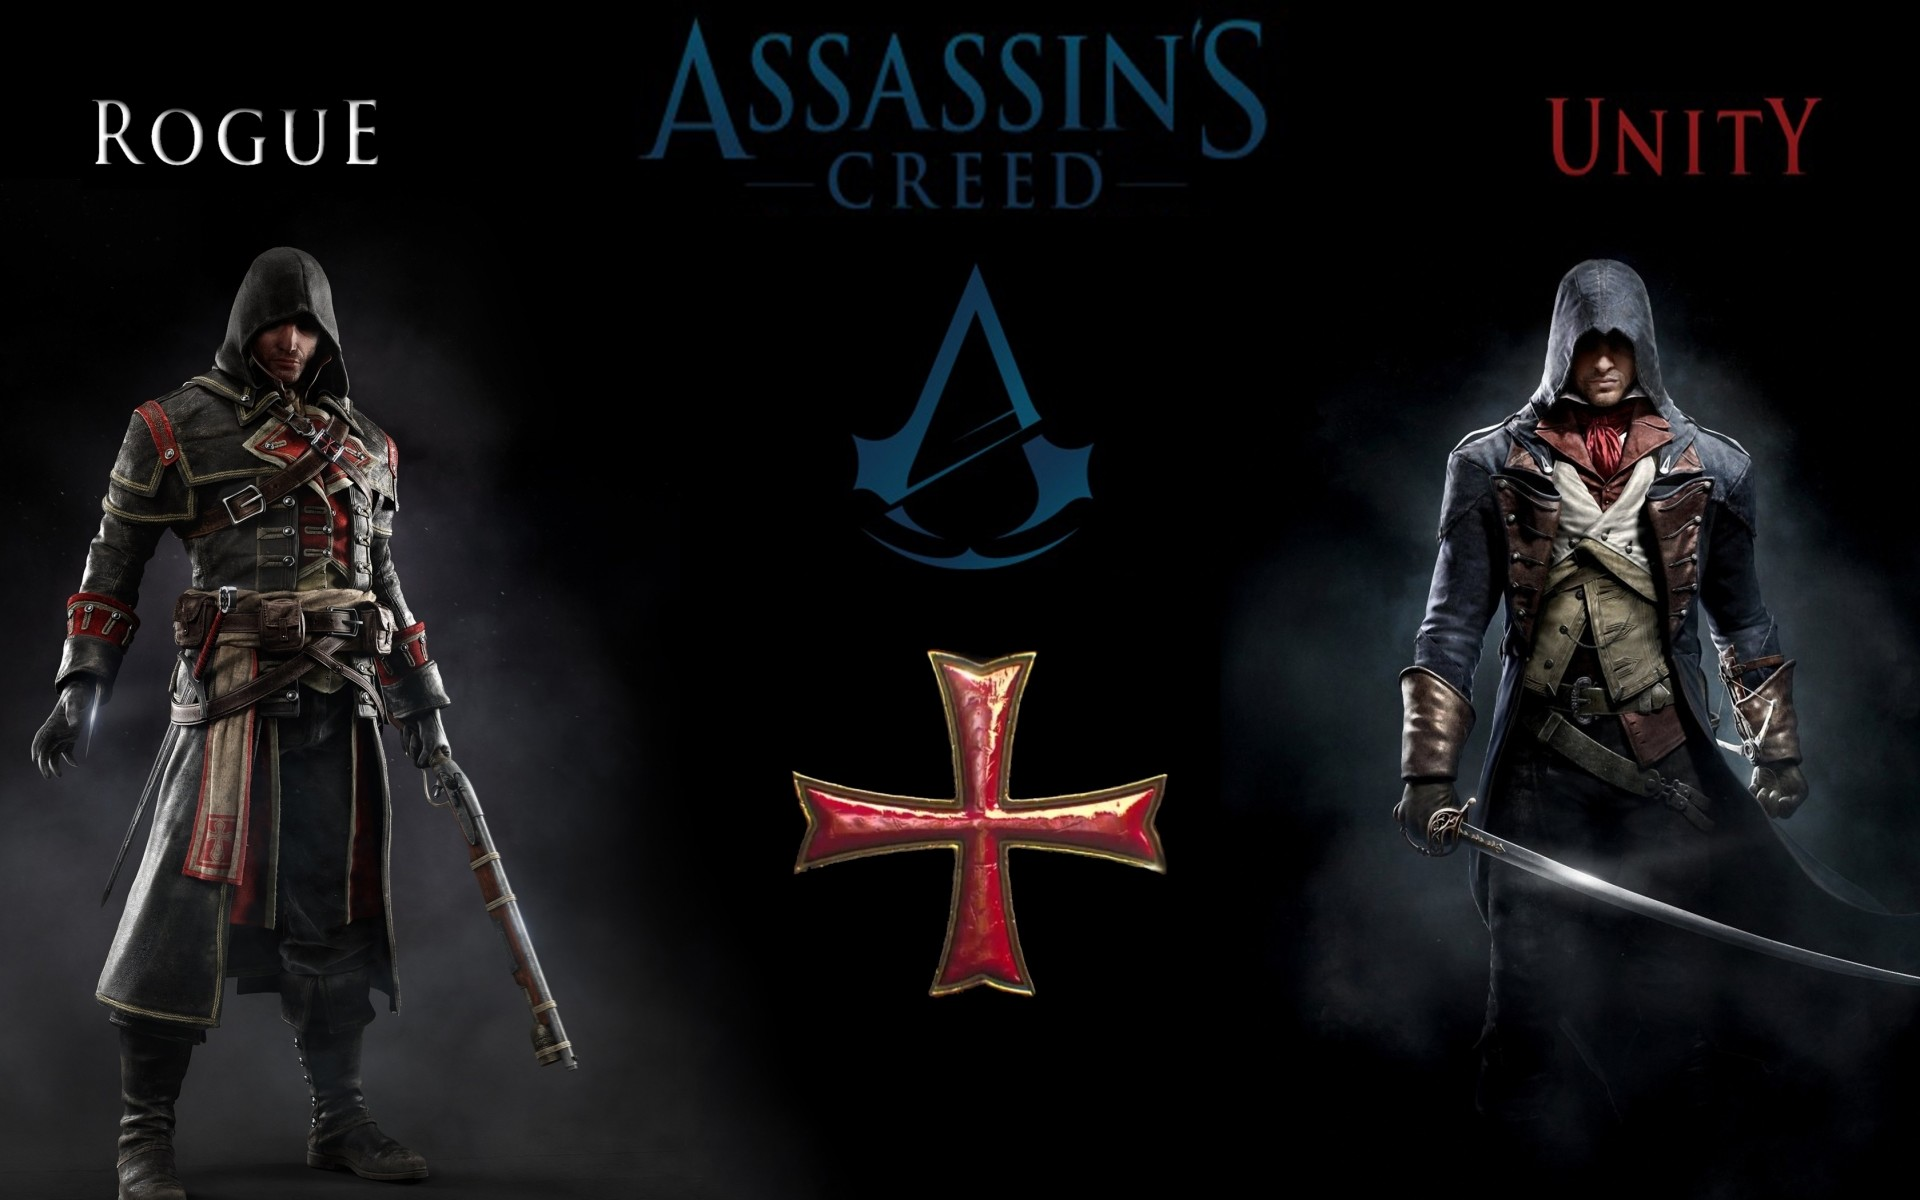 Wallpaper 1080p Assassin's Creed Unity Rogue Video Game HD wallpaper .